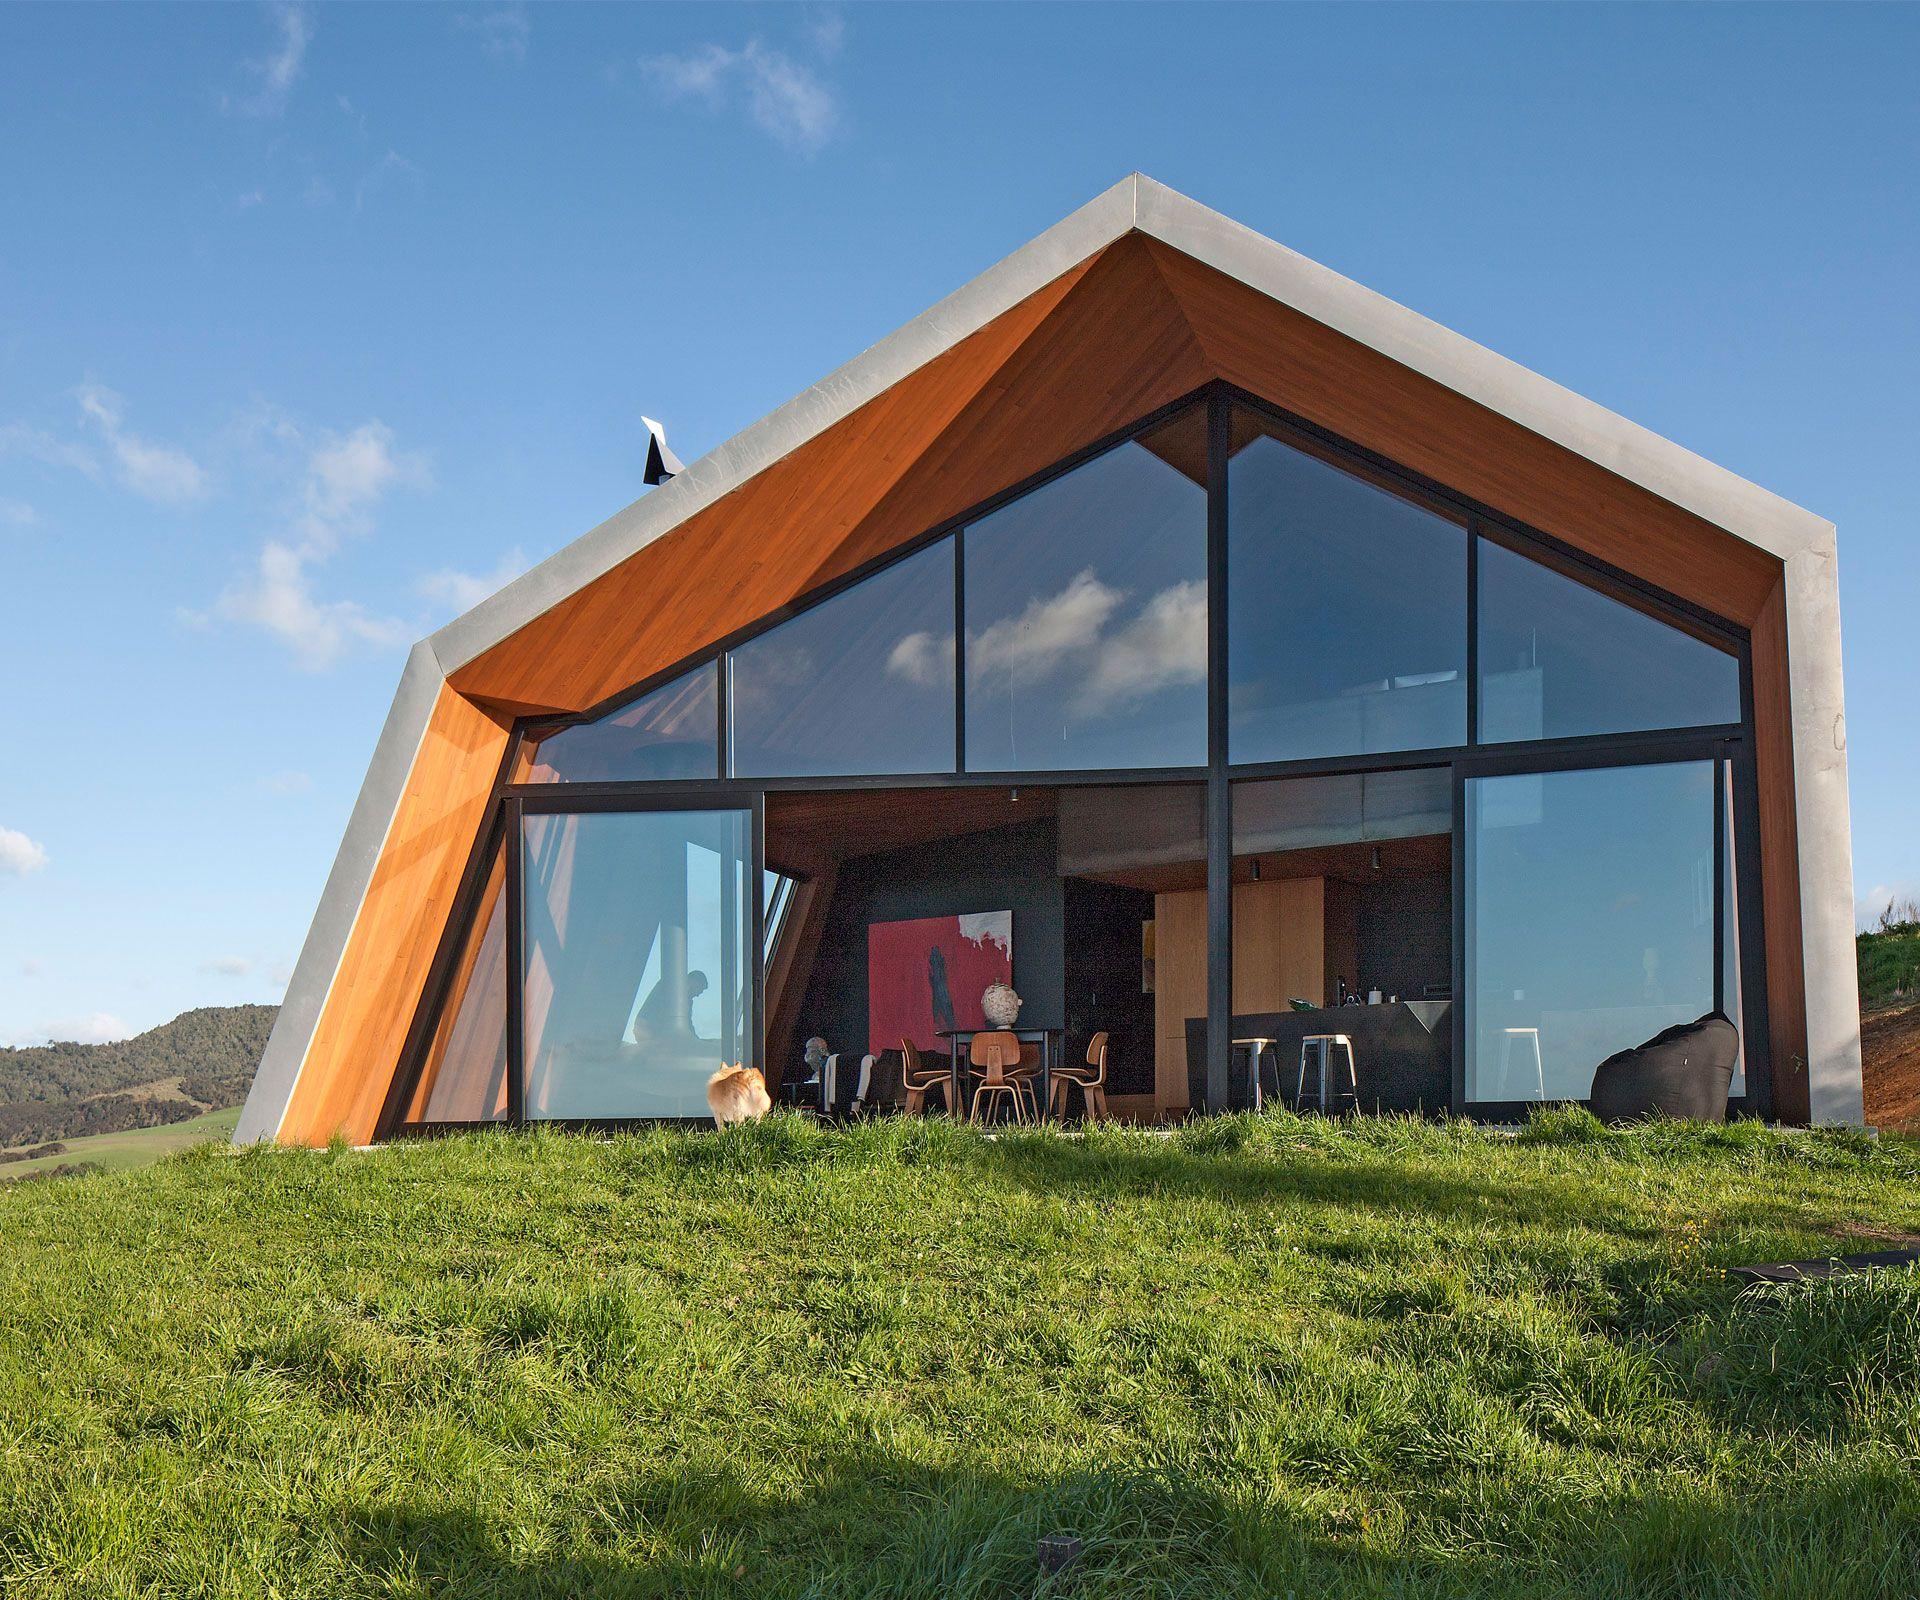 The Crossing Pakiri New Zealand designed by architect Paul